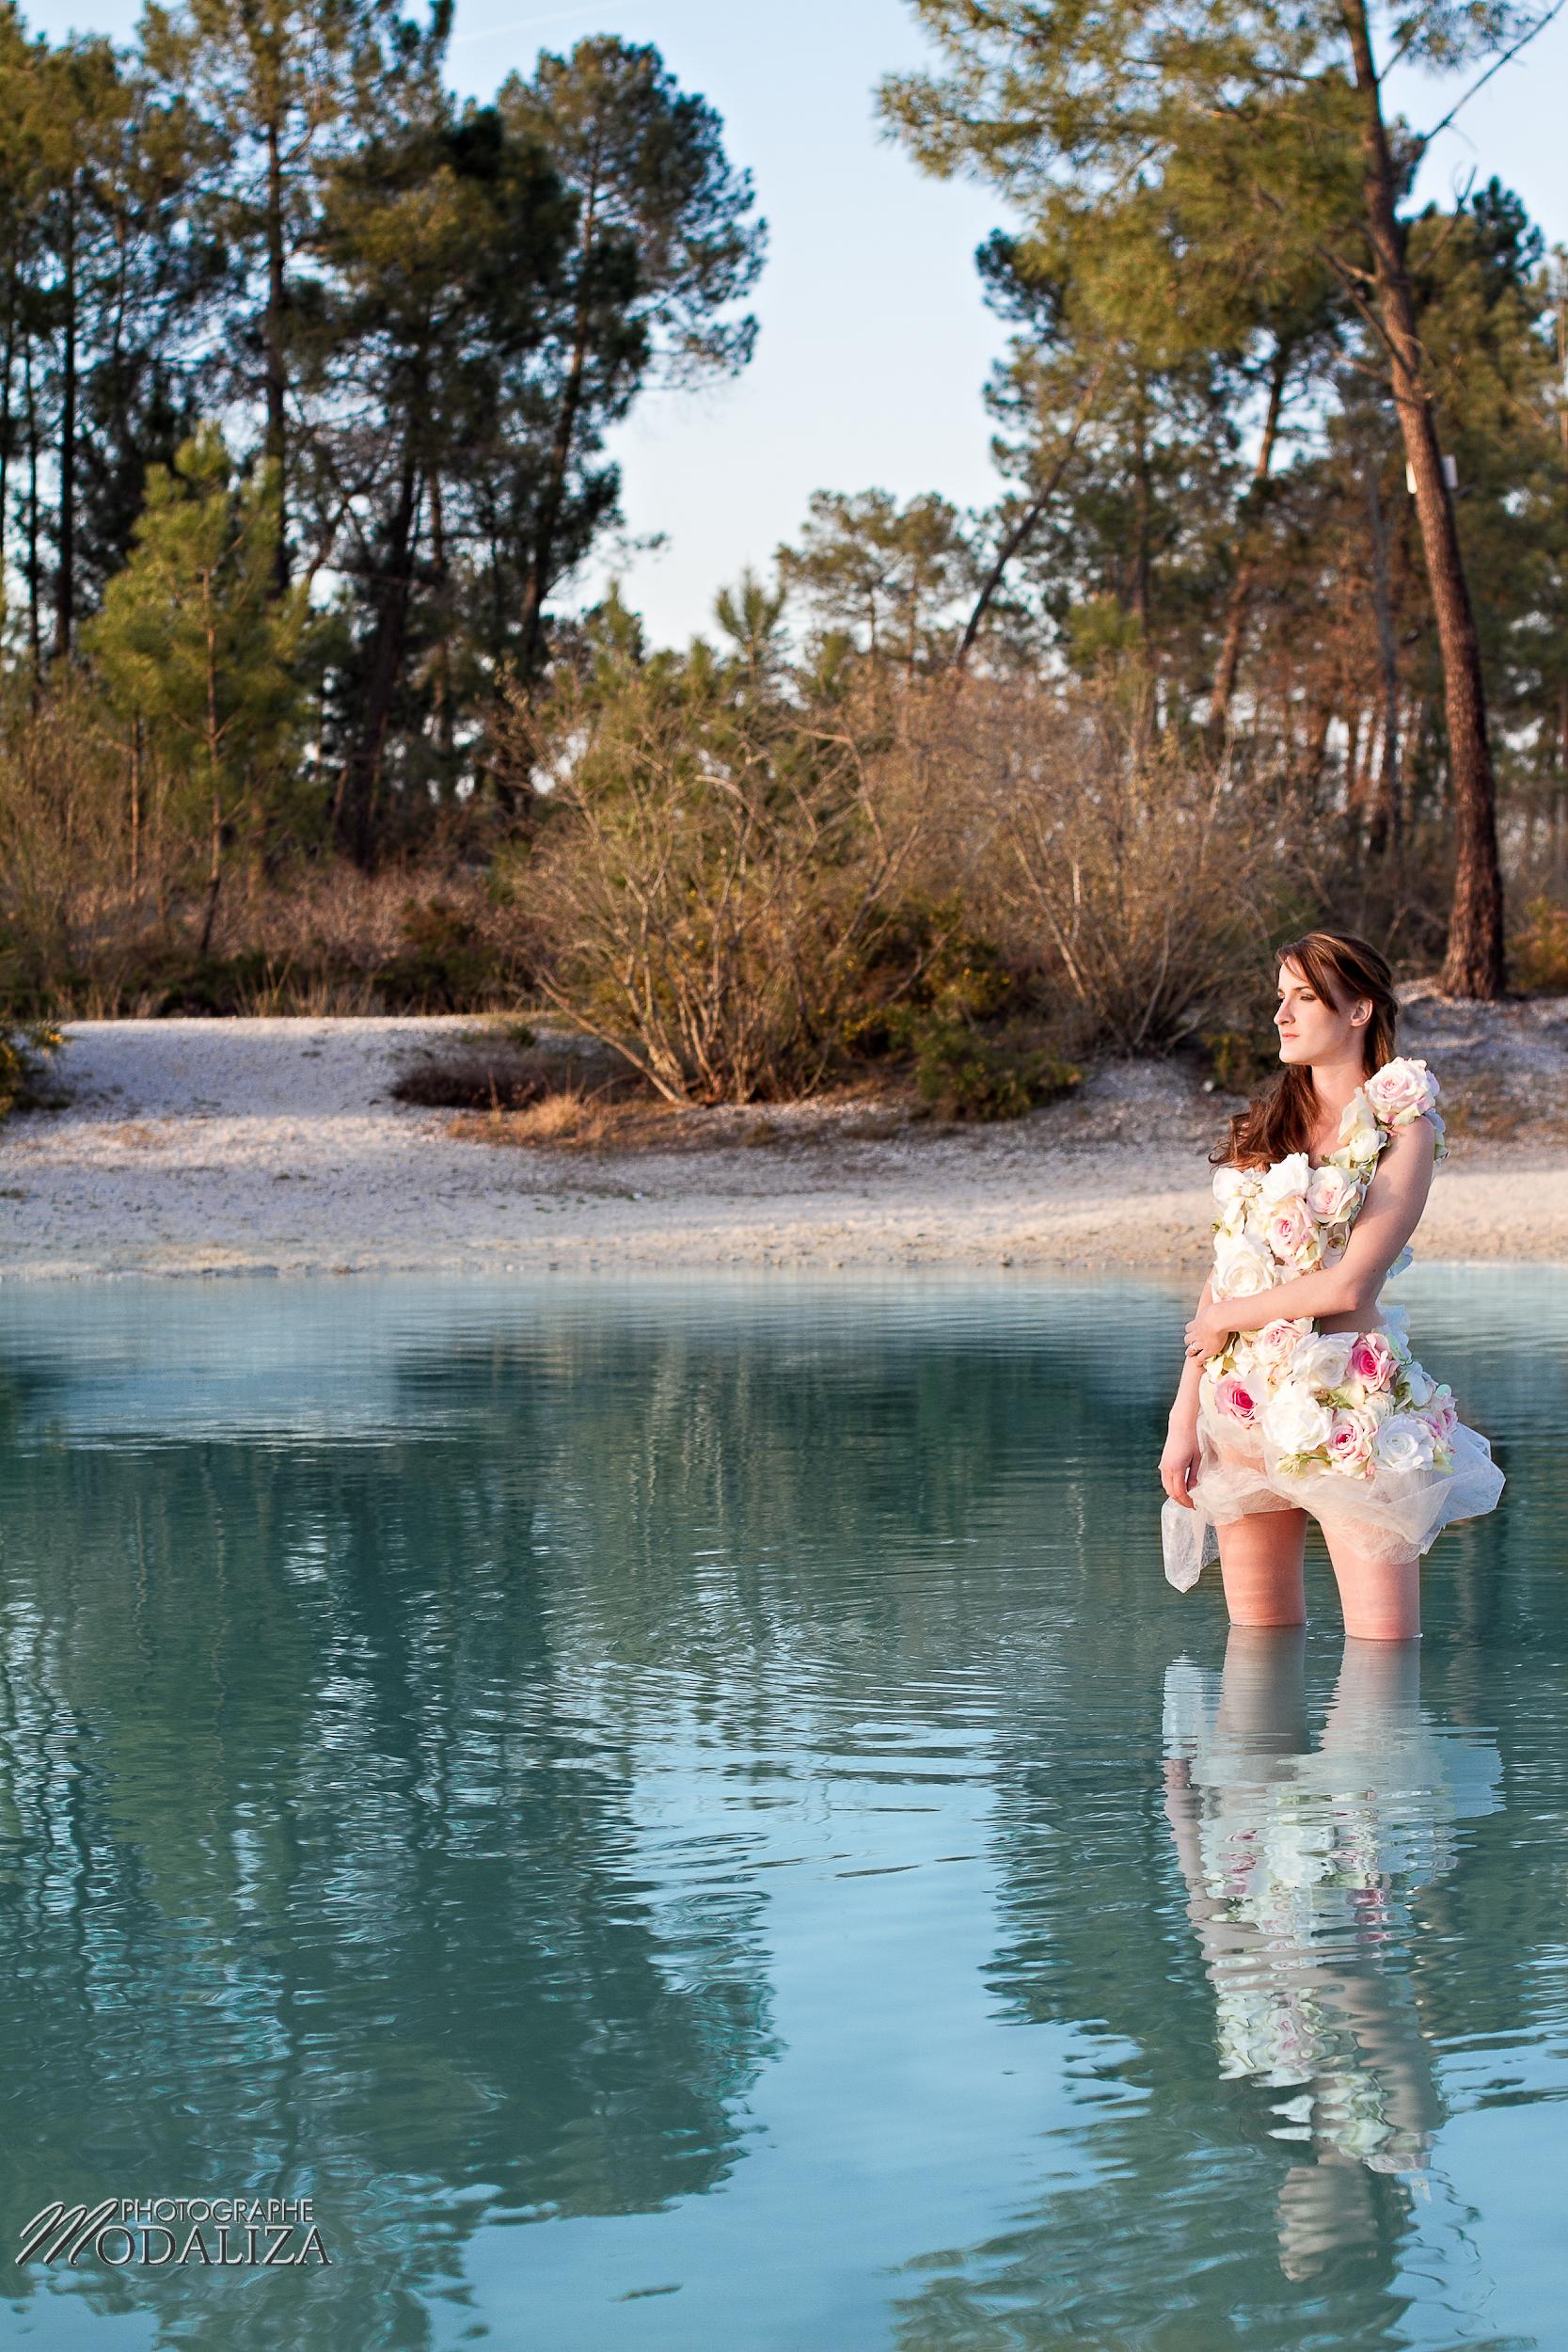 photo mariee inspiration shoot mode nature robe fleur confidentiel tendance mariage gironde bordeaux mariee en colere by modaliza -0345